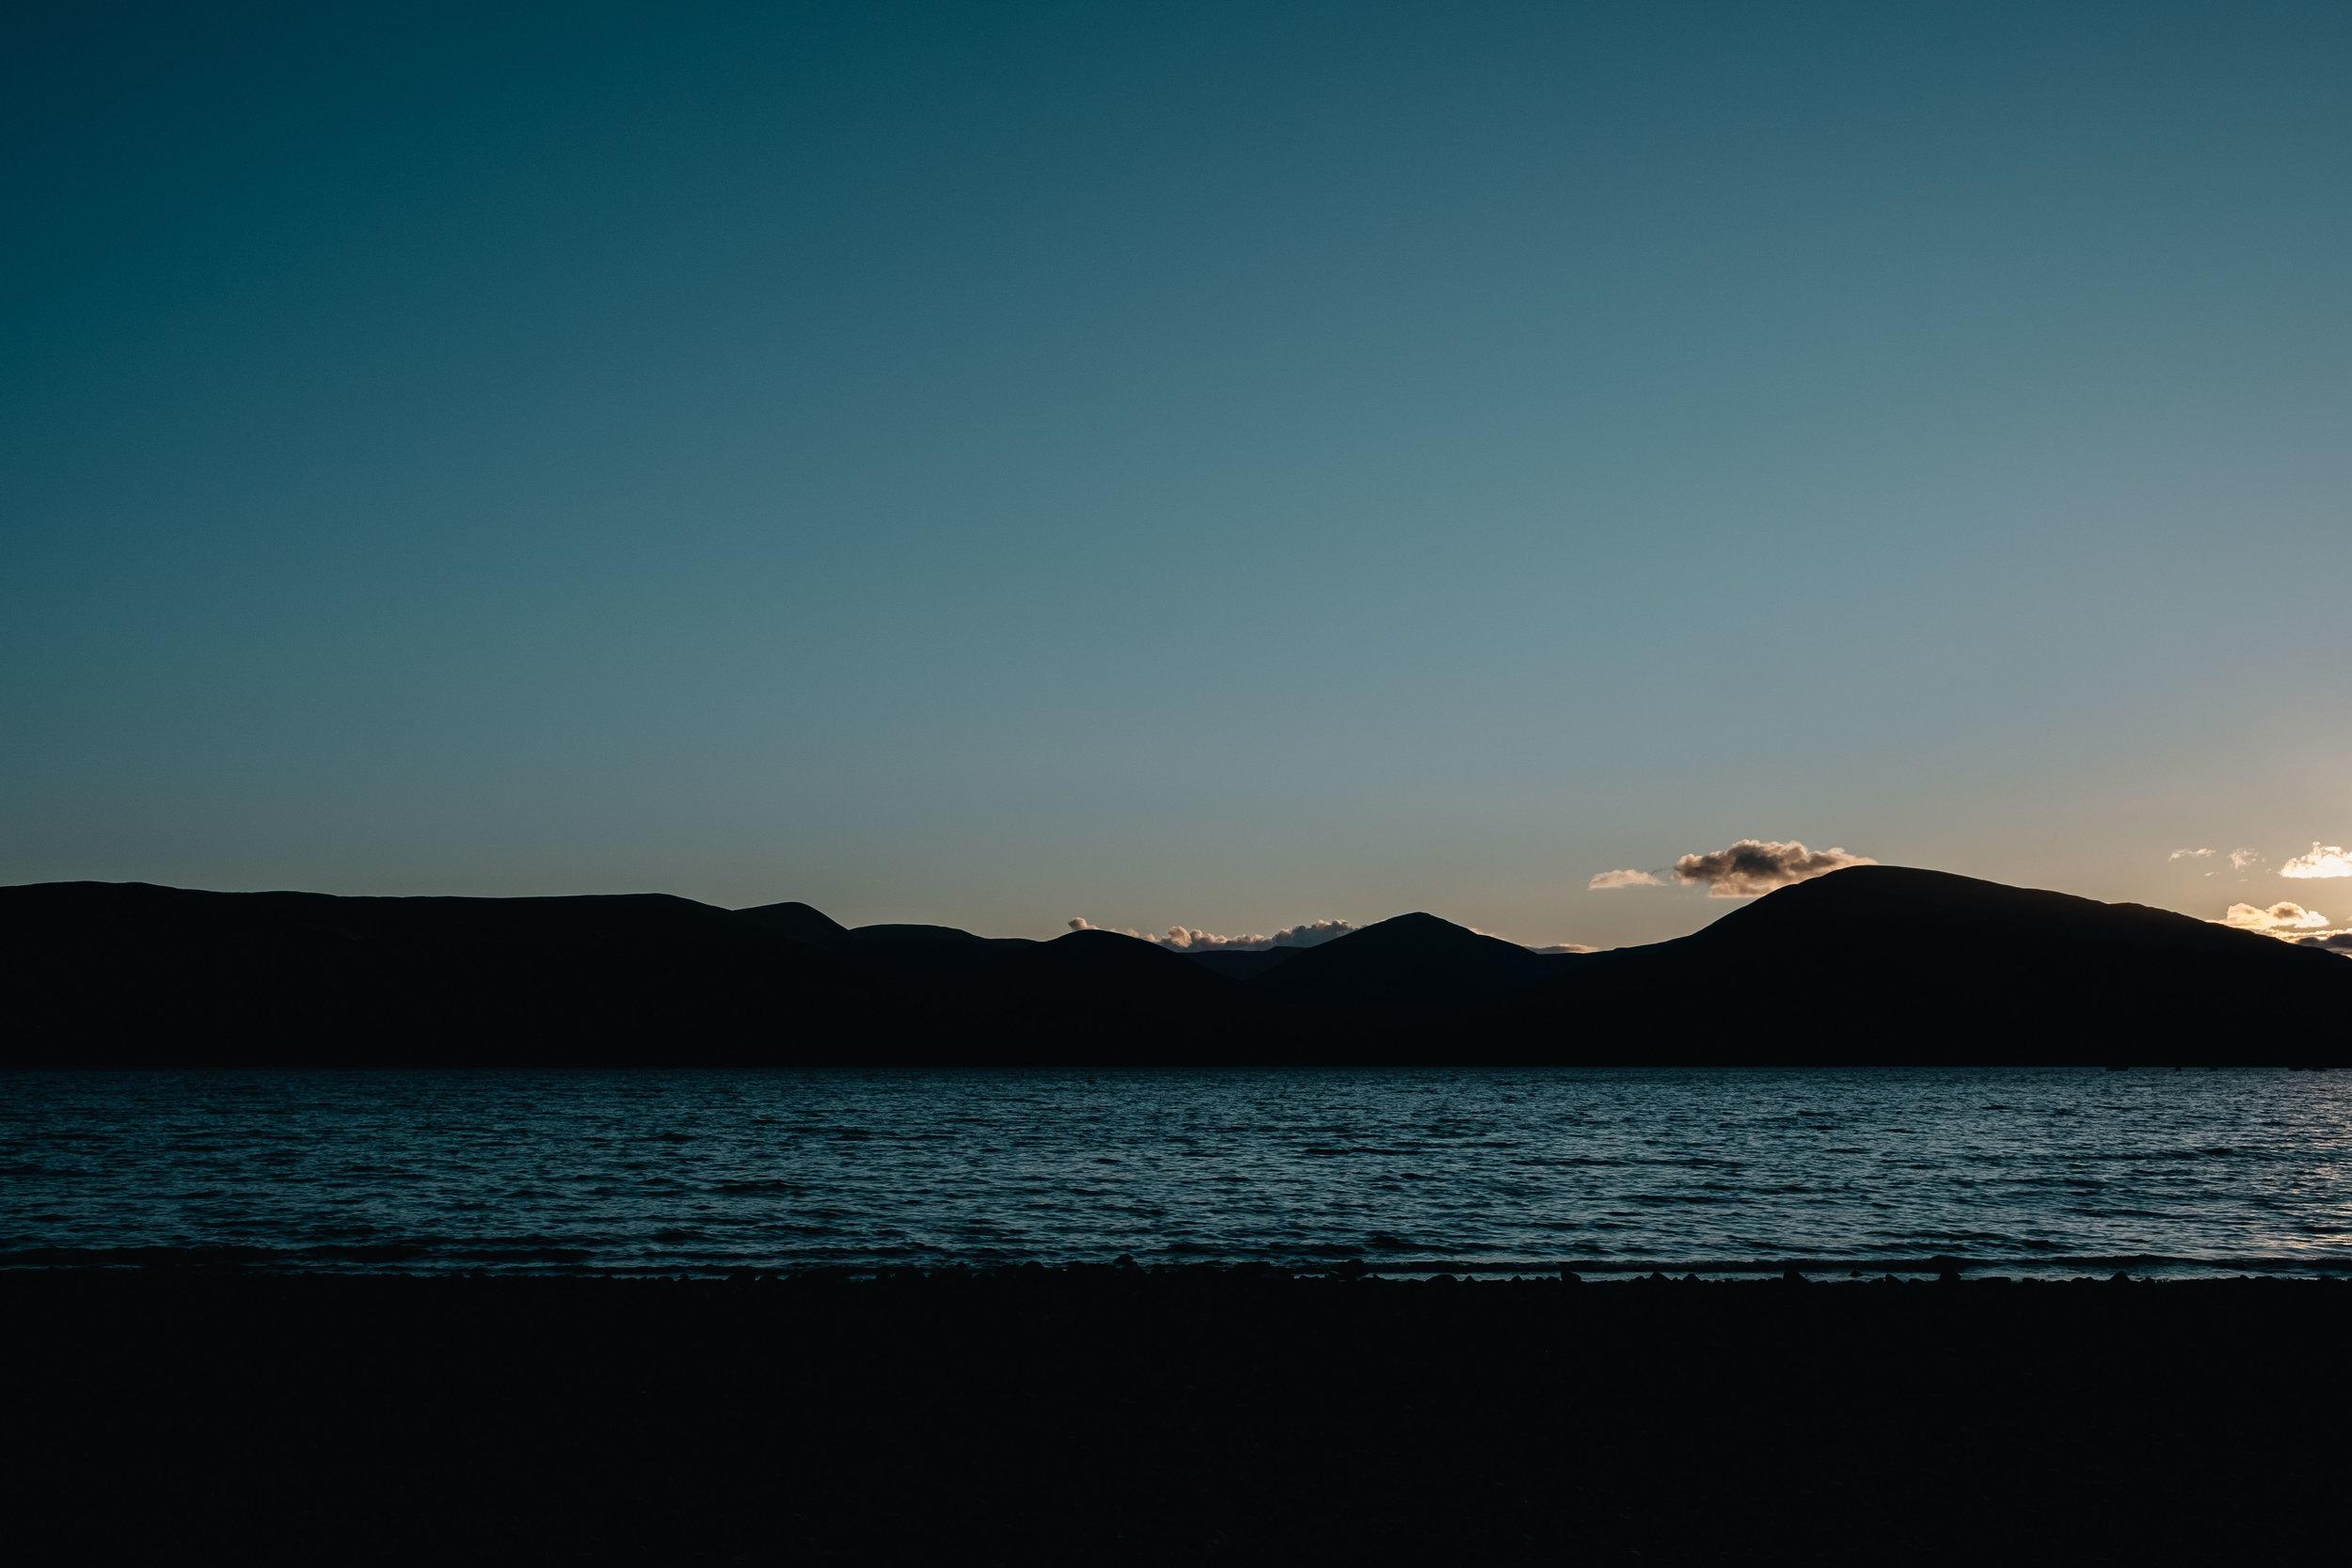 a dusky sunset scene